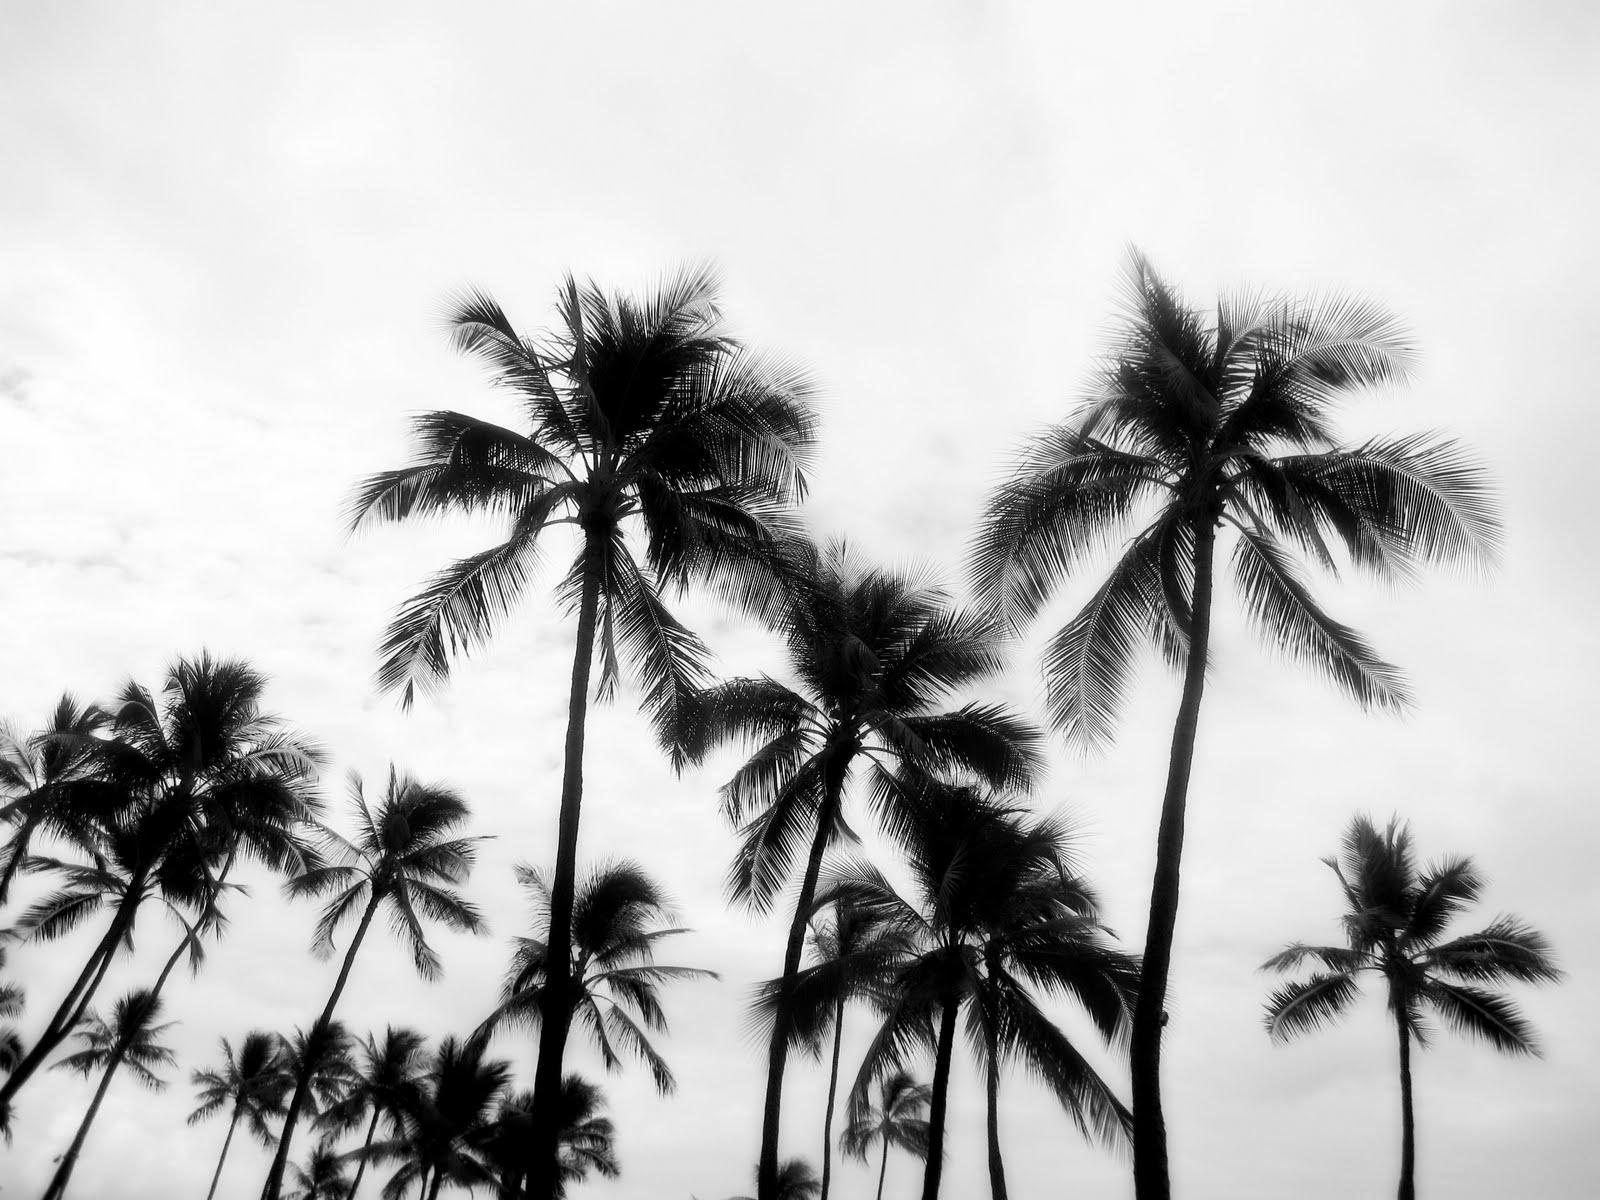 palm tree white - photo #8